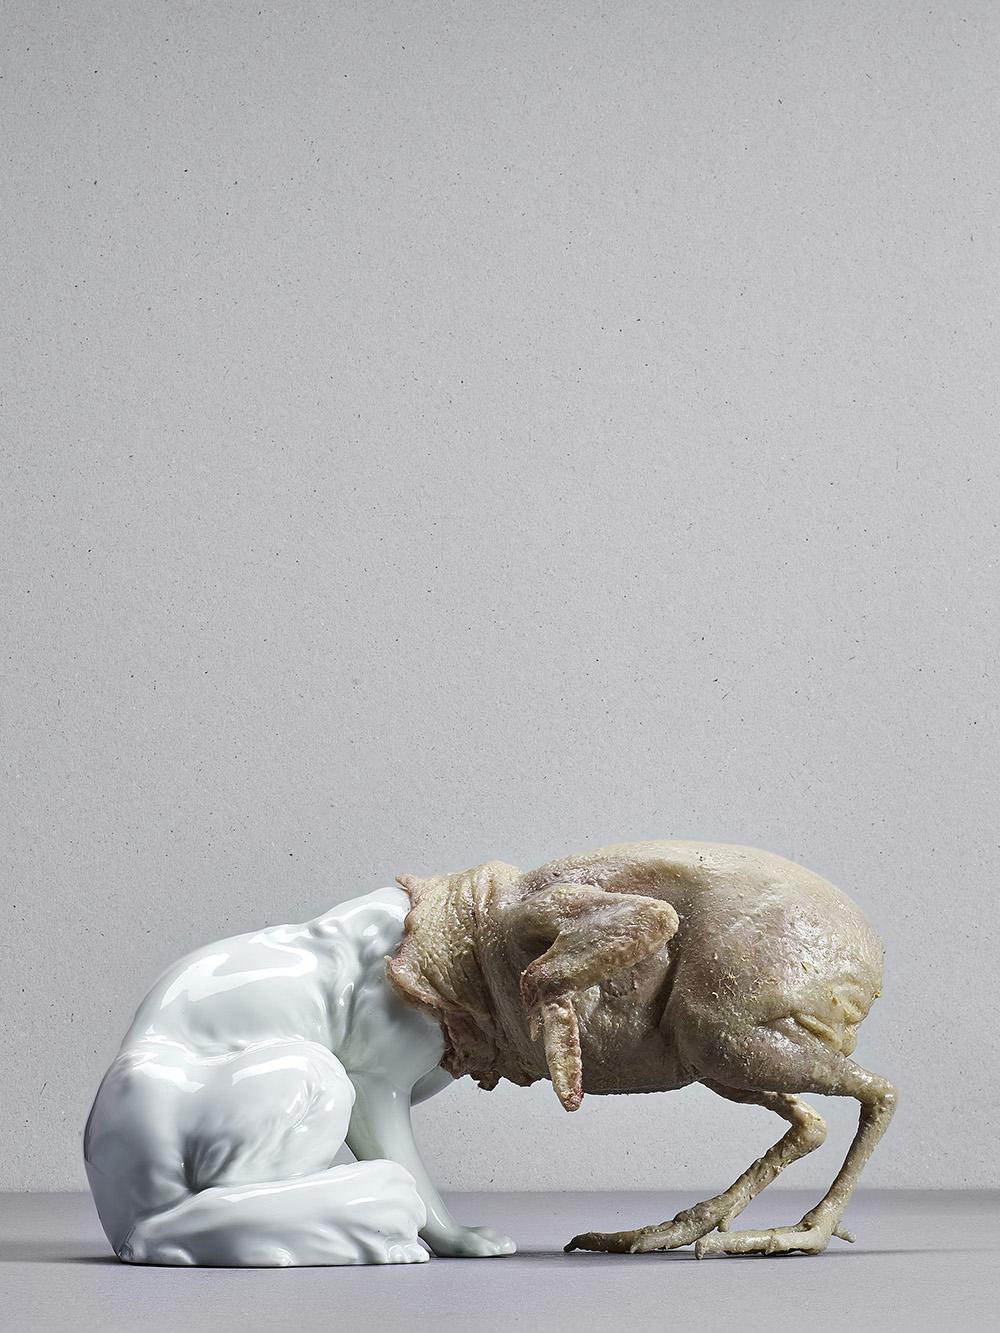 untitled (desertfox), Augarten porcellain, silicone, silicone paint, 15 x 8 x 20 cm,2015